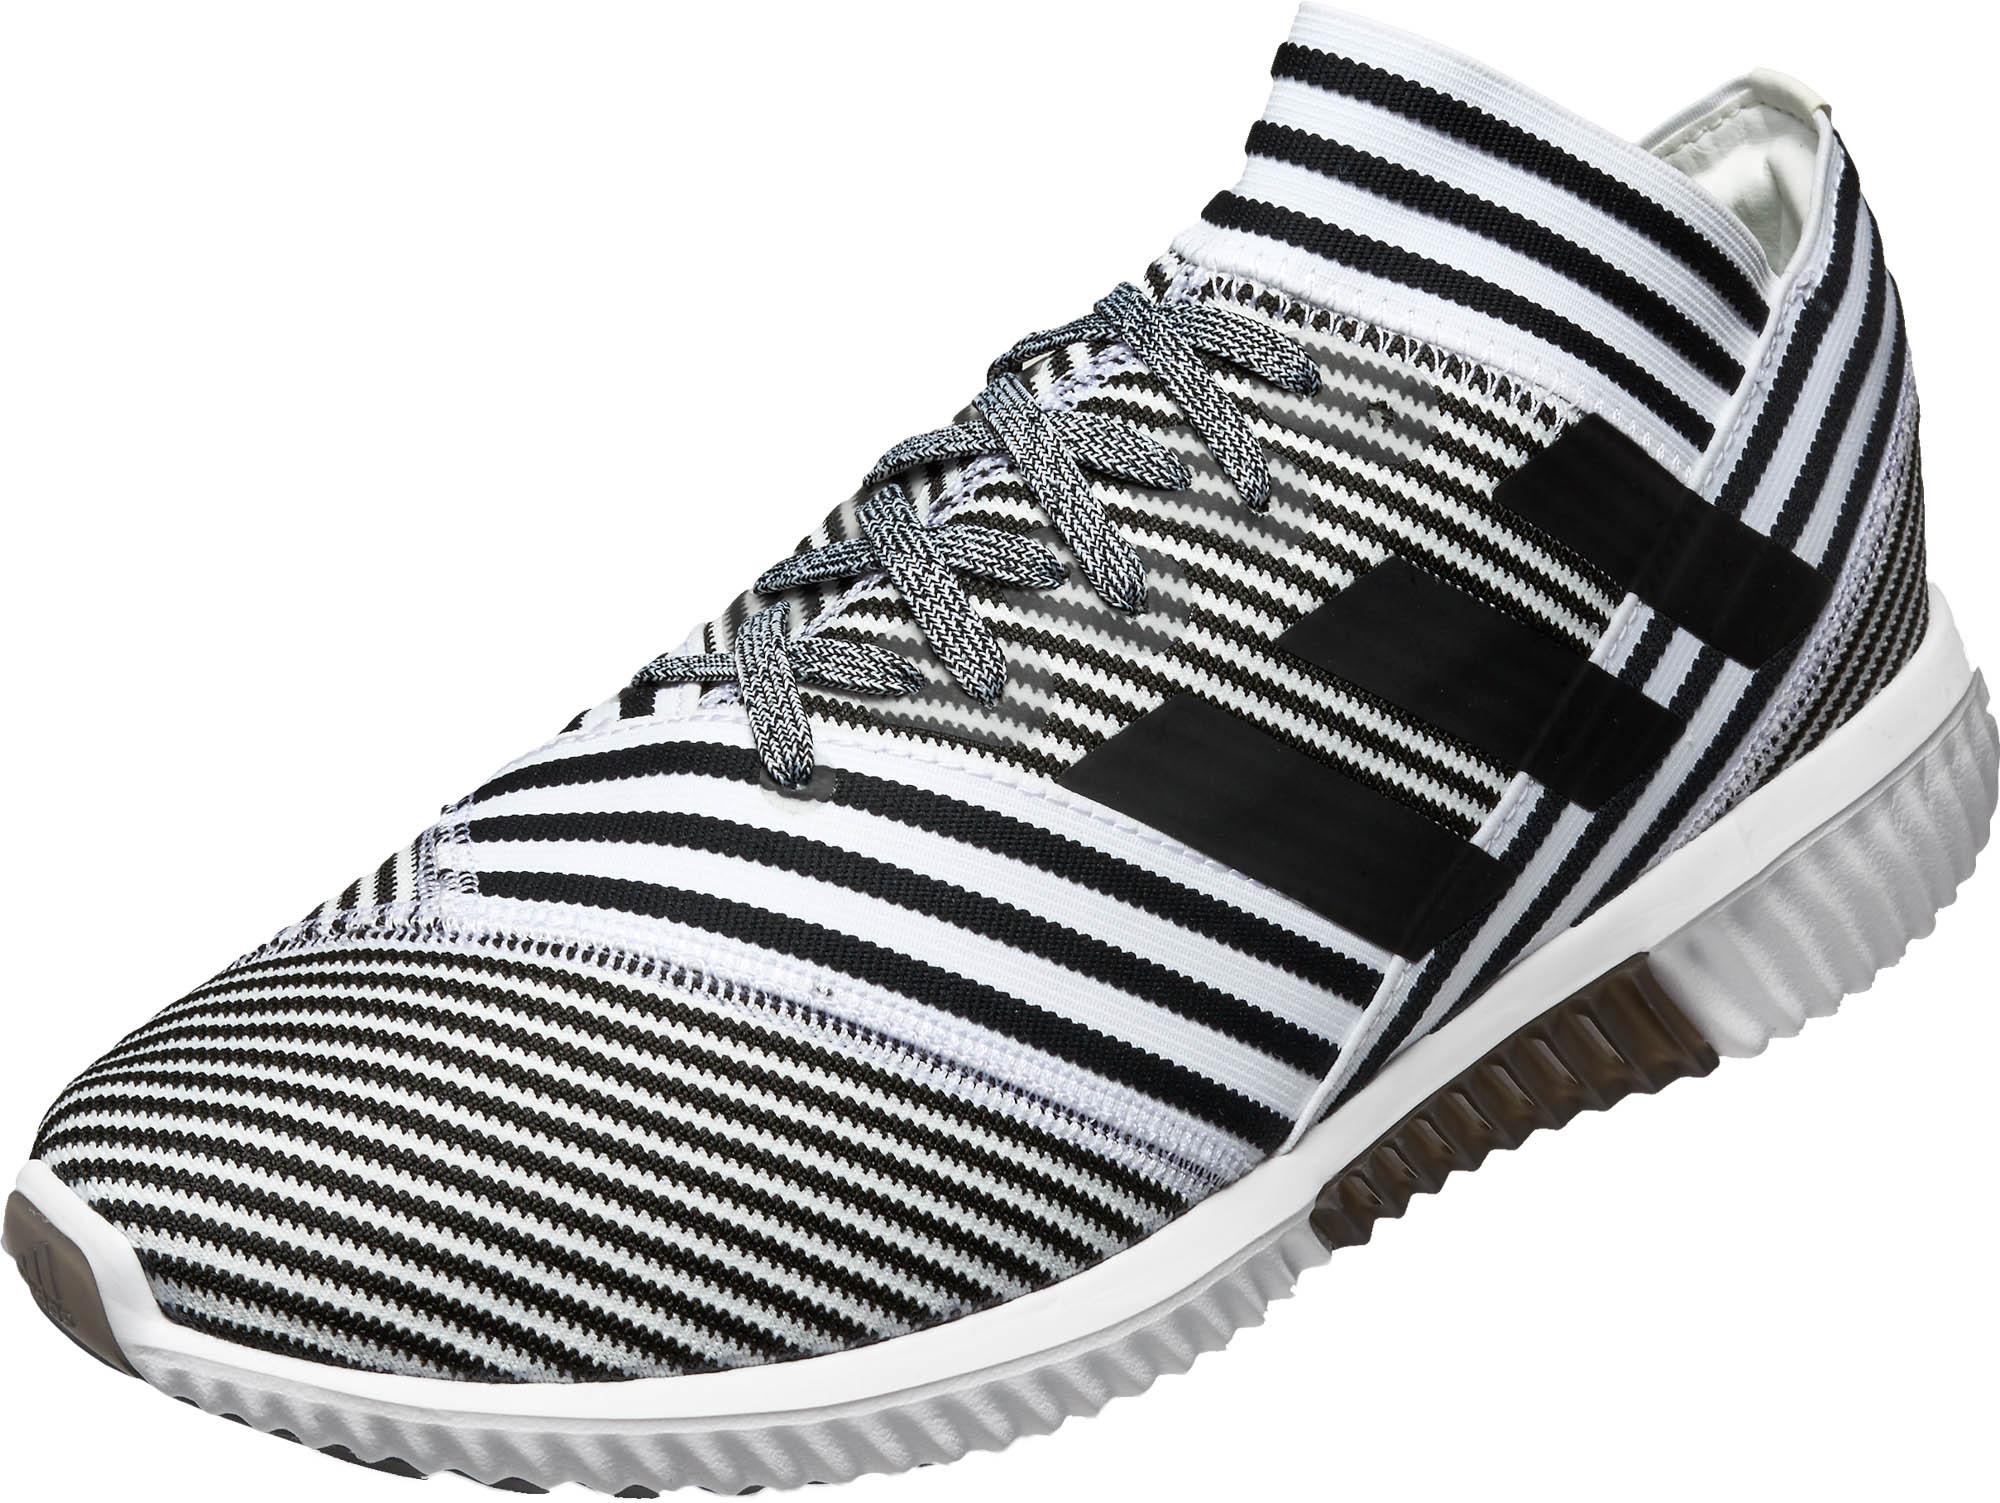 adidas Nemeziz Tango 17.1 TR - White Soccer Cleats aa3b26301